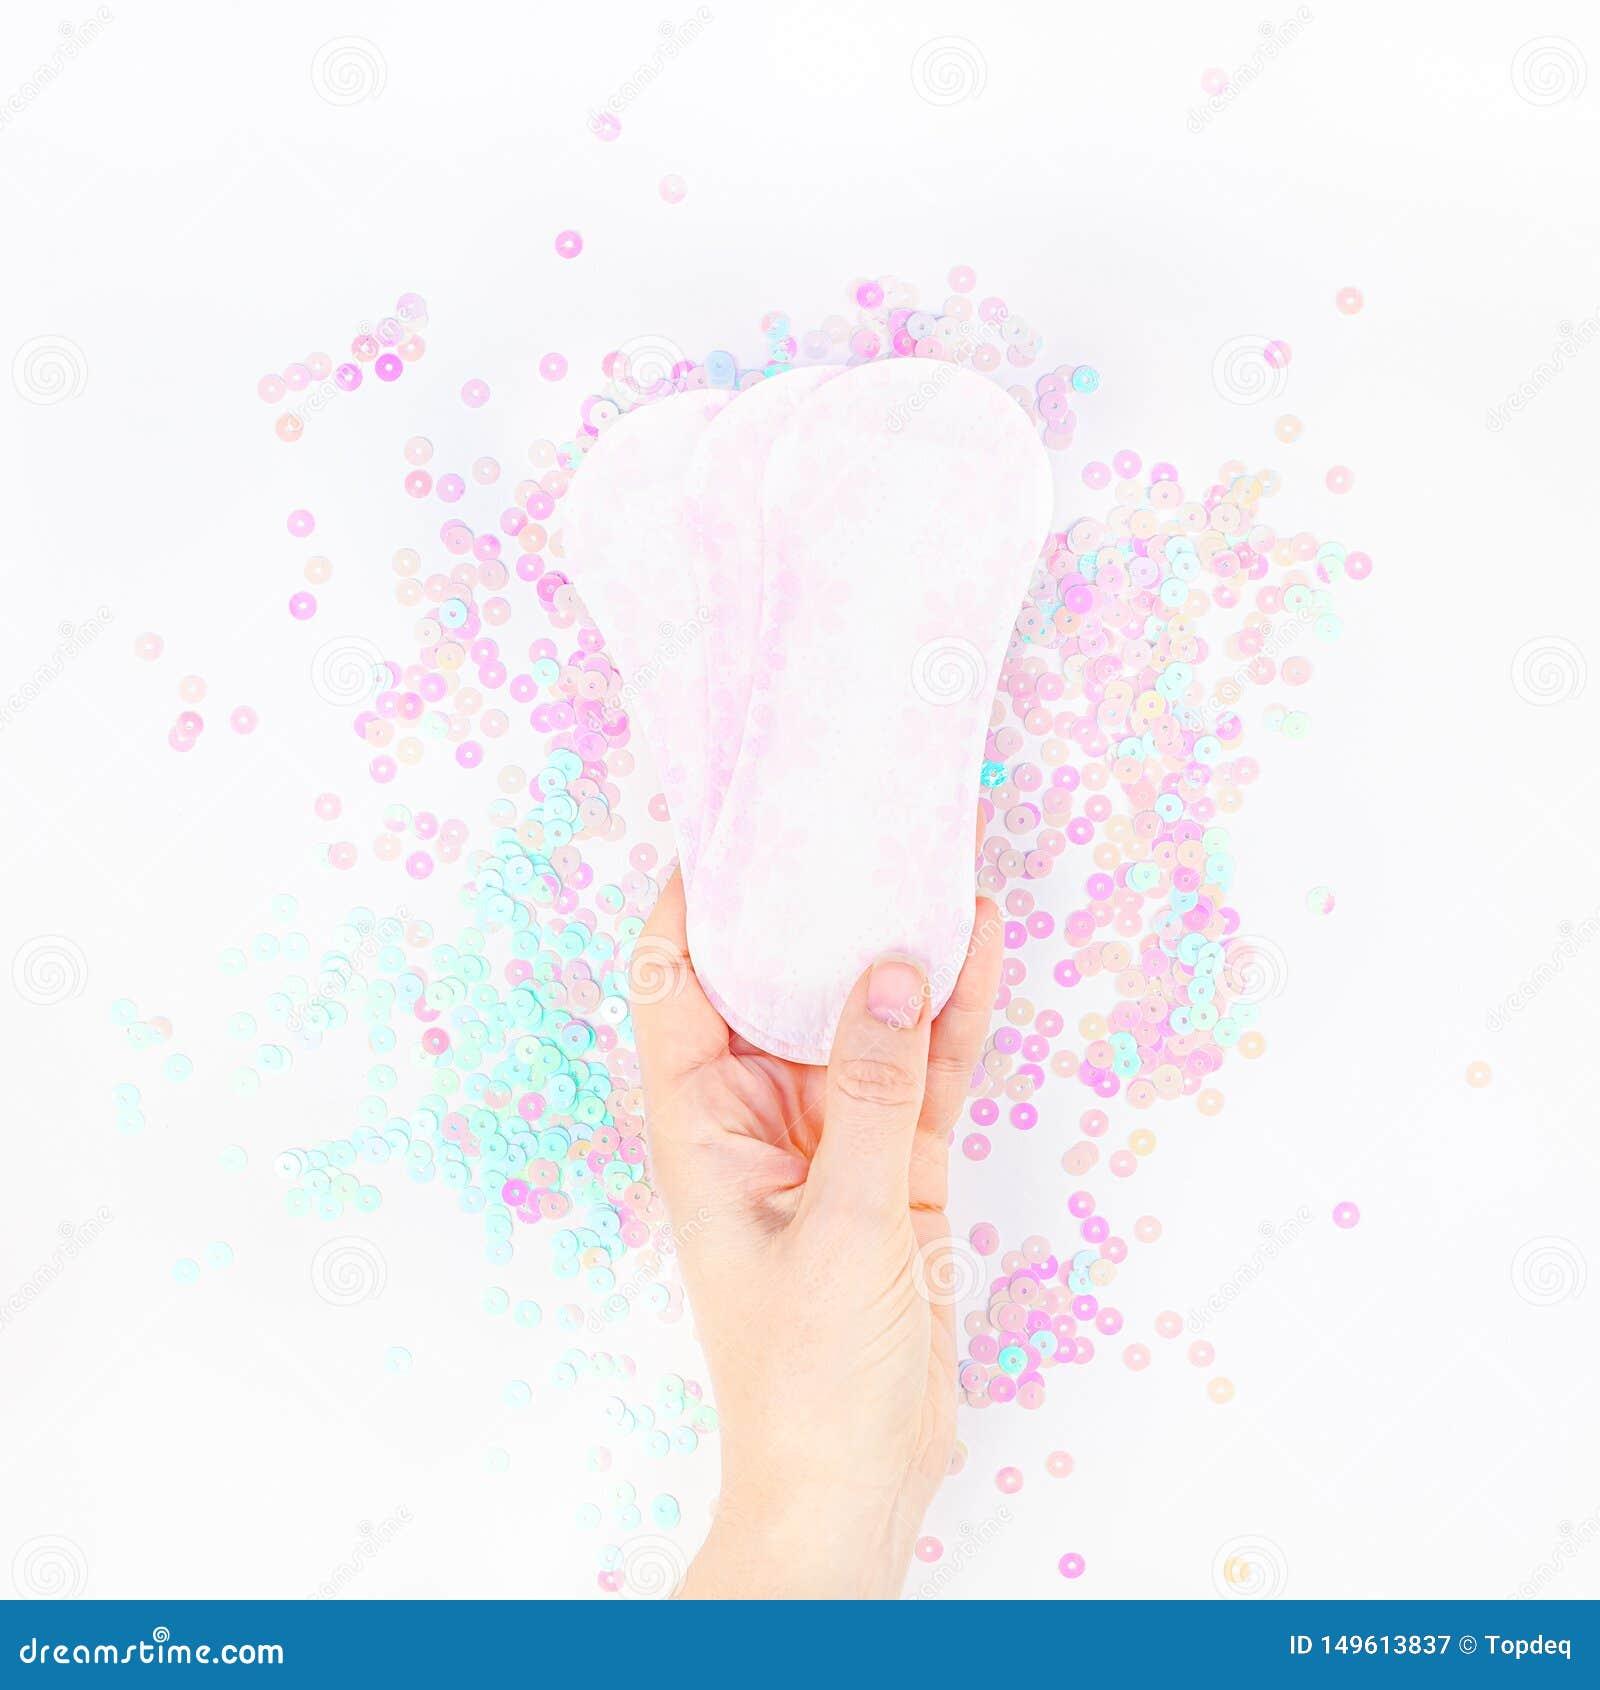 Woman hand holding daily sanitary napkins